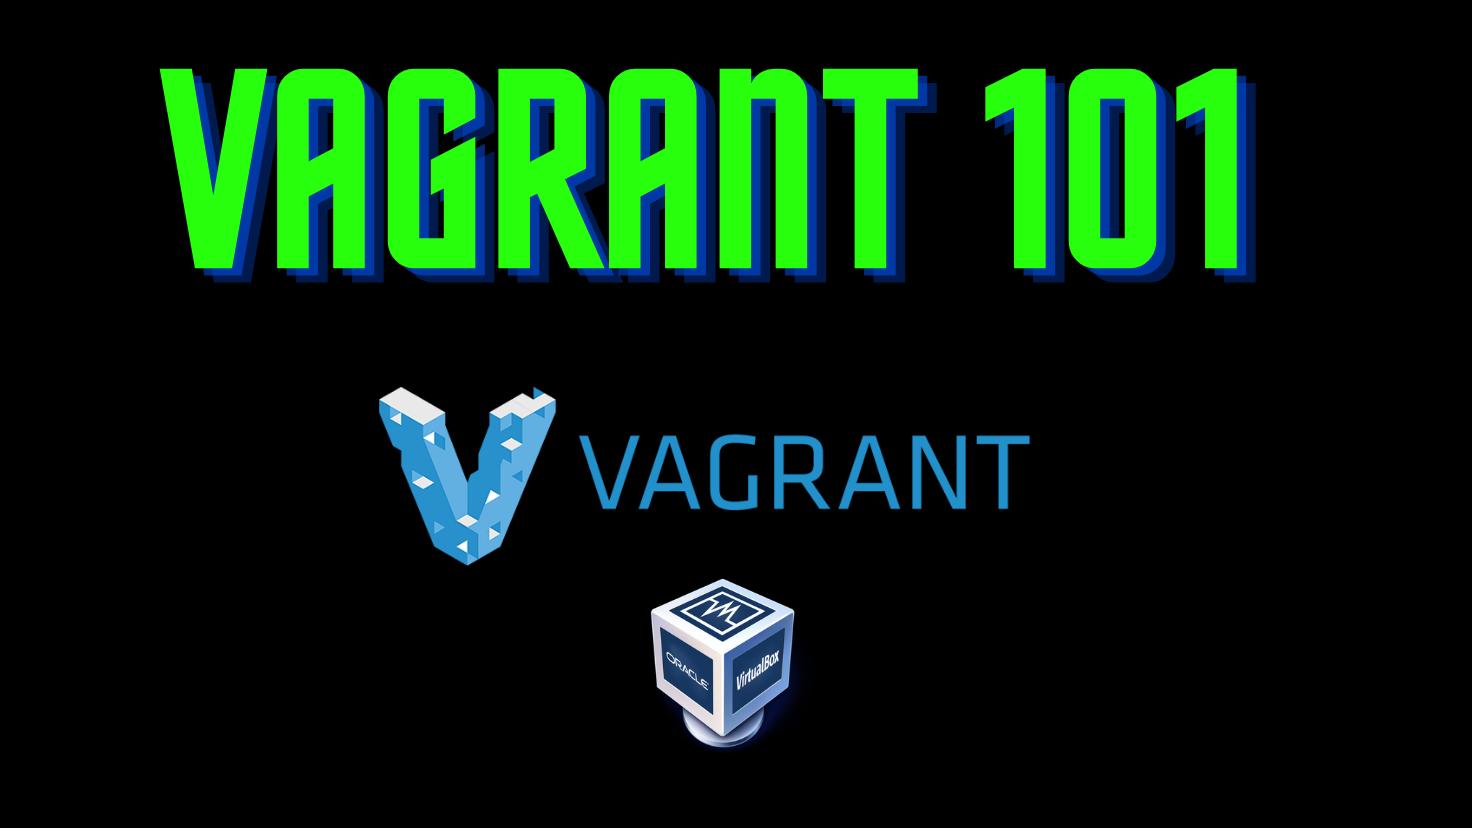 Vagrant 101